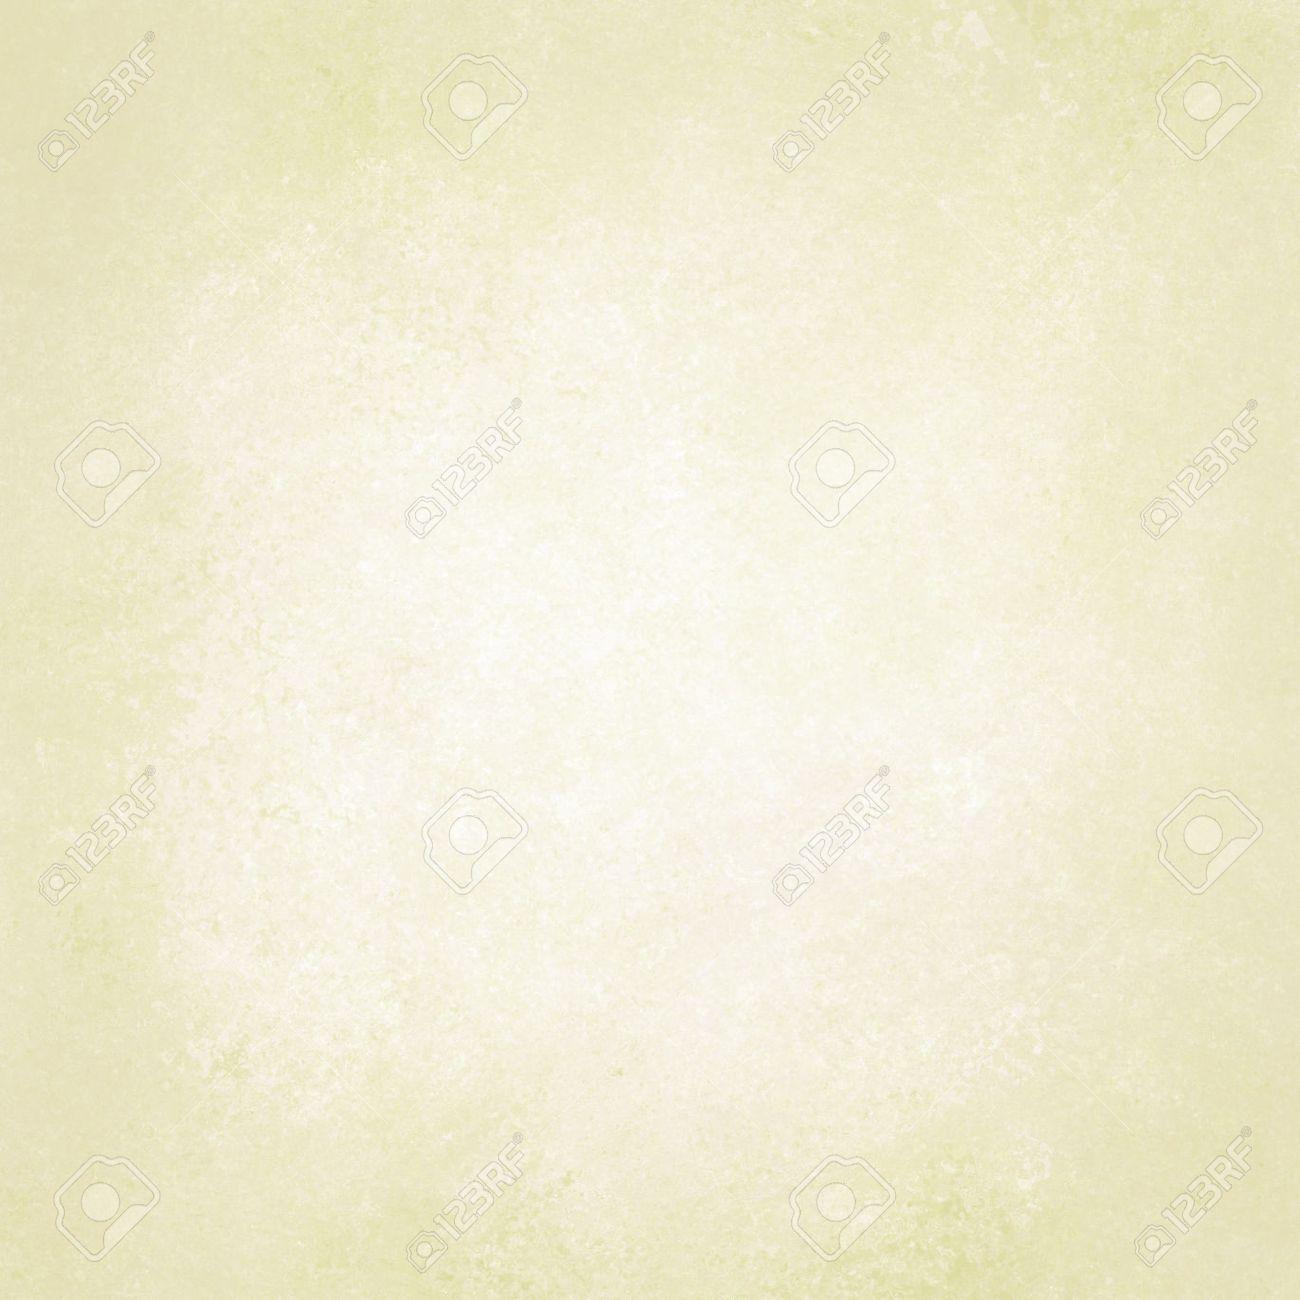 Pastel Geel Papier Achtergrond, Witte Of Bleke Gouden Beige ...